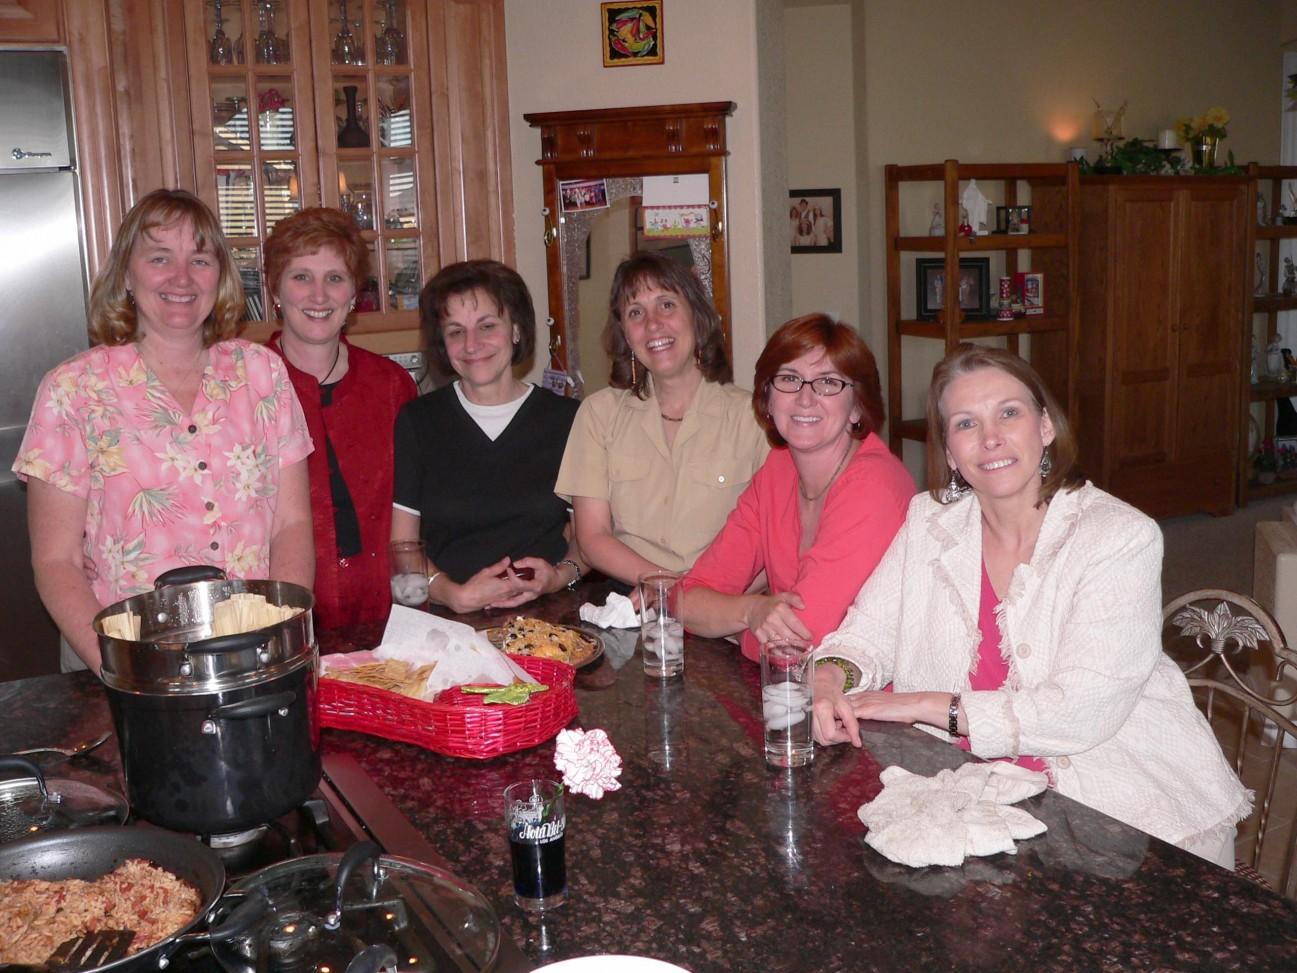 Bookies at Judy's House